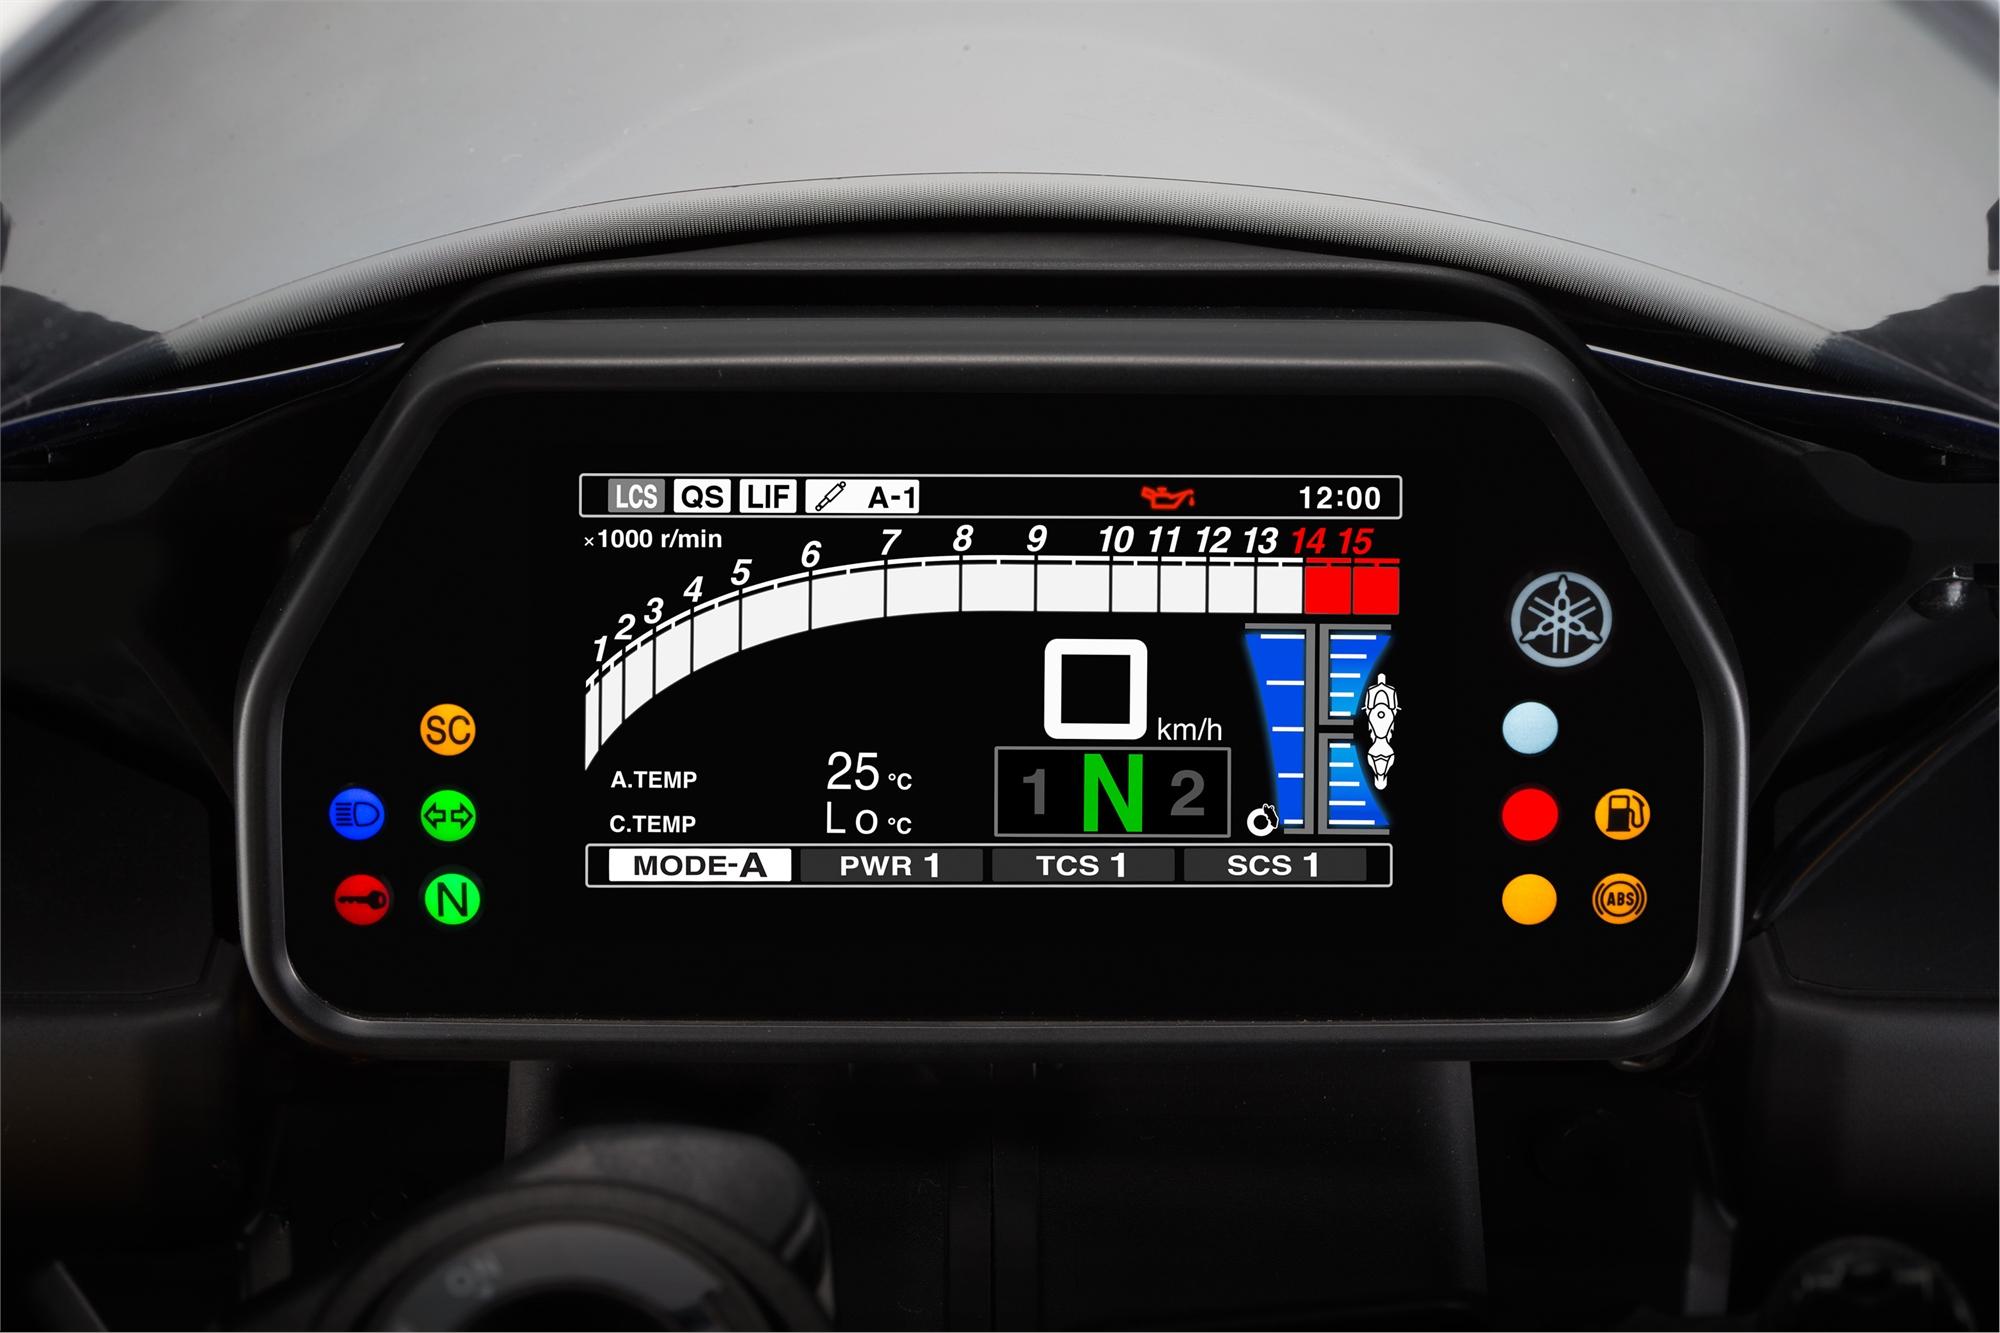 2015 Yamaha Yzf R1 Studio And Action Shots Show More